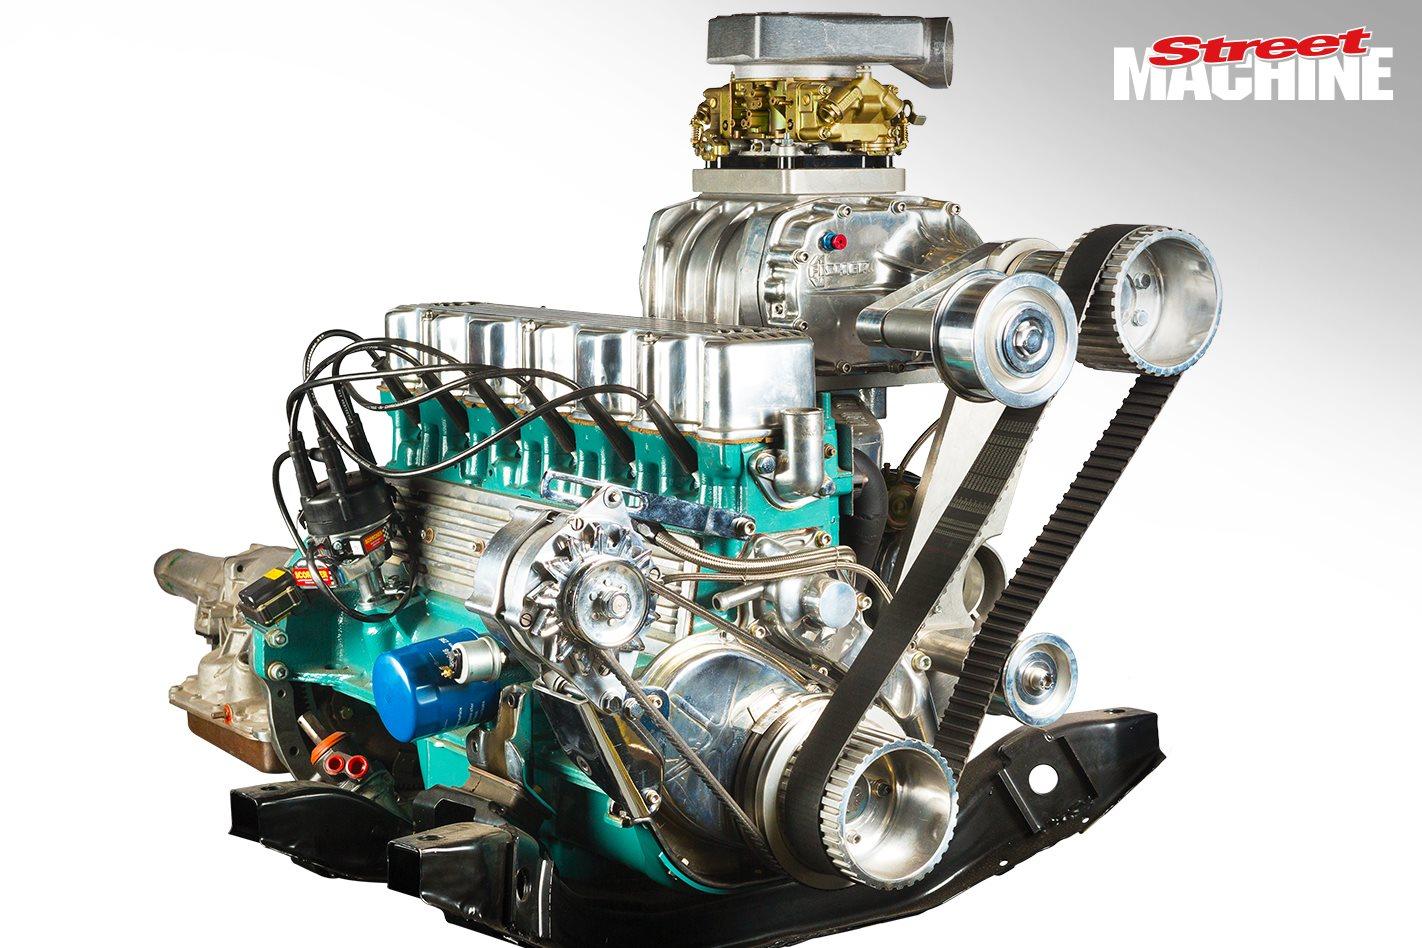 Turbo and supercharged Hemi six engine